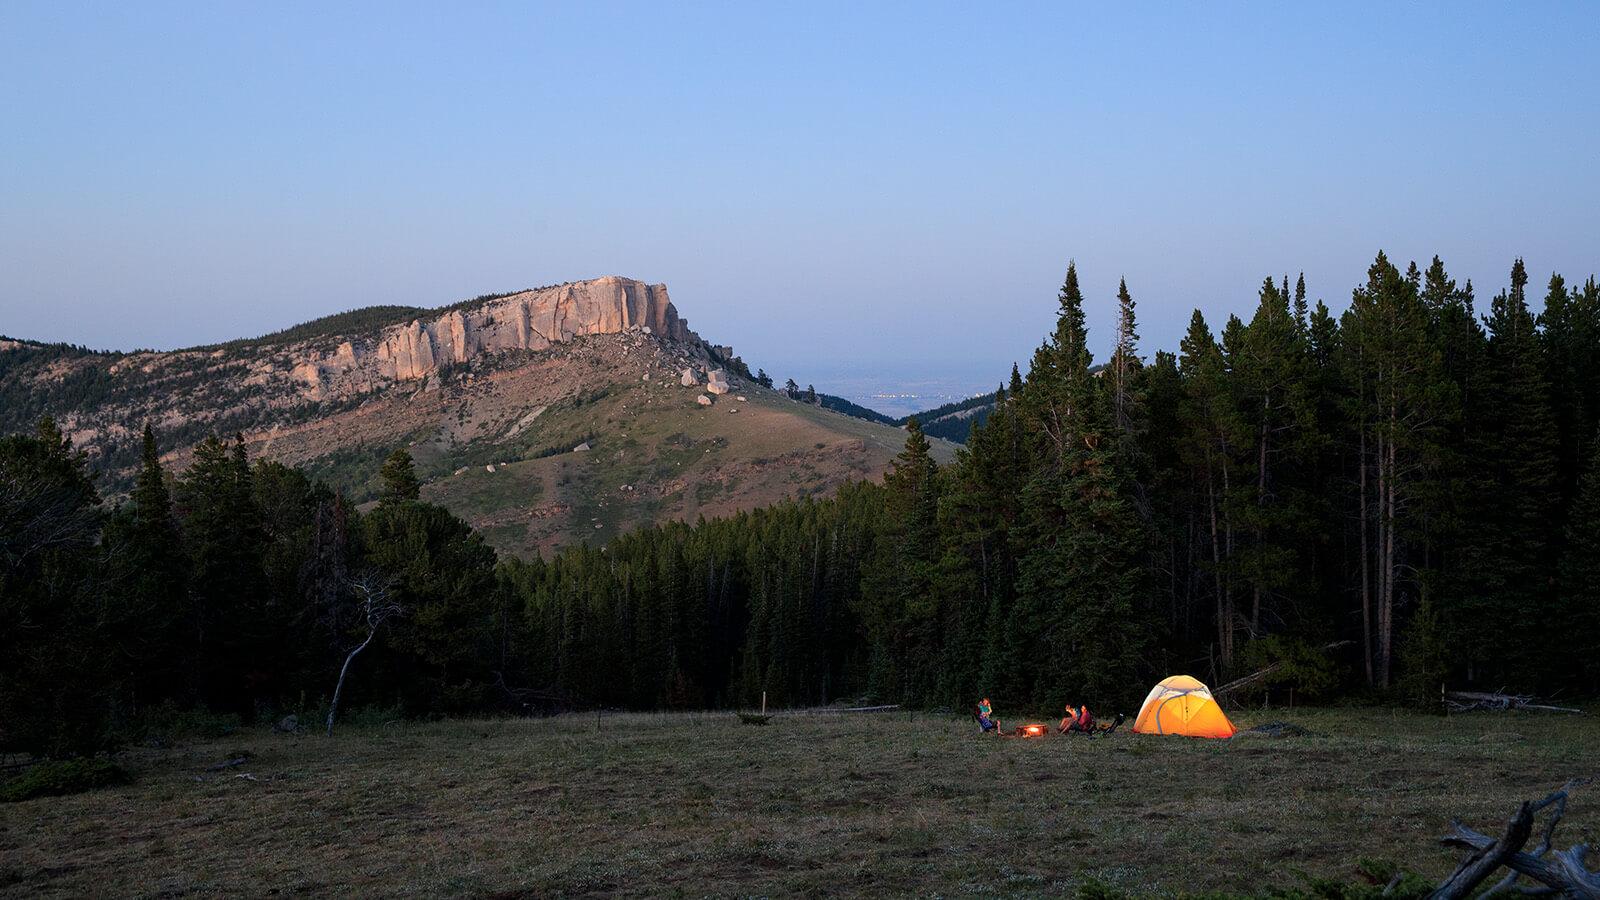 Campsite setup below mountainside